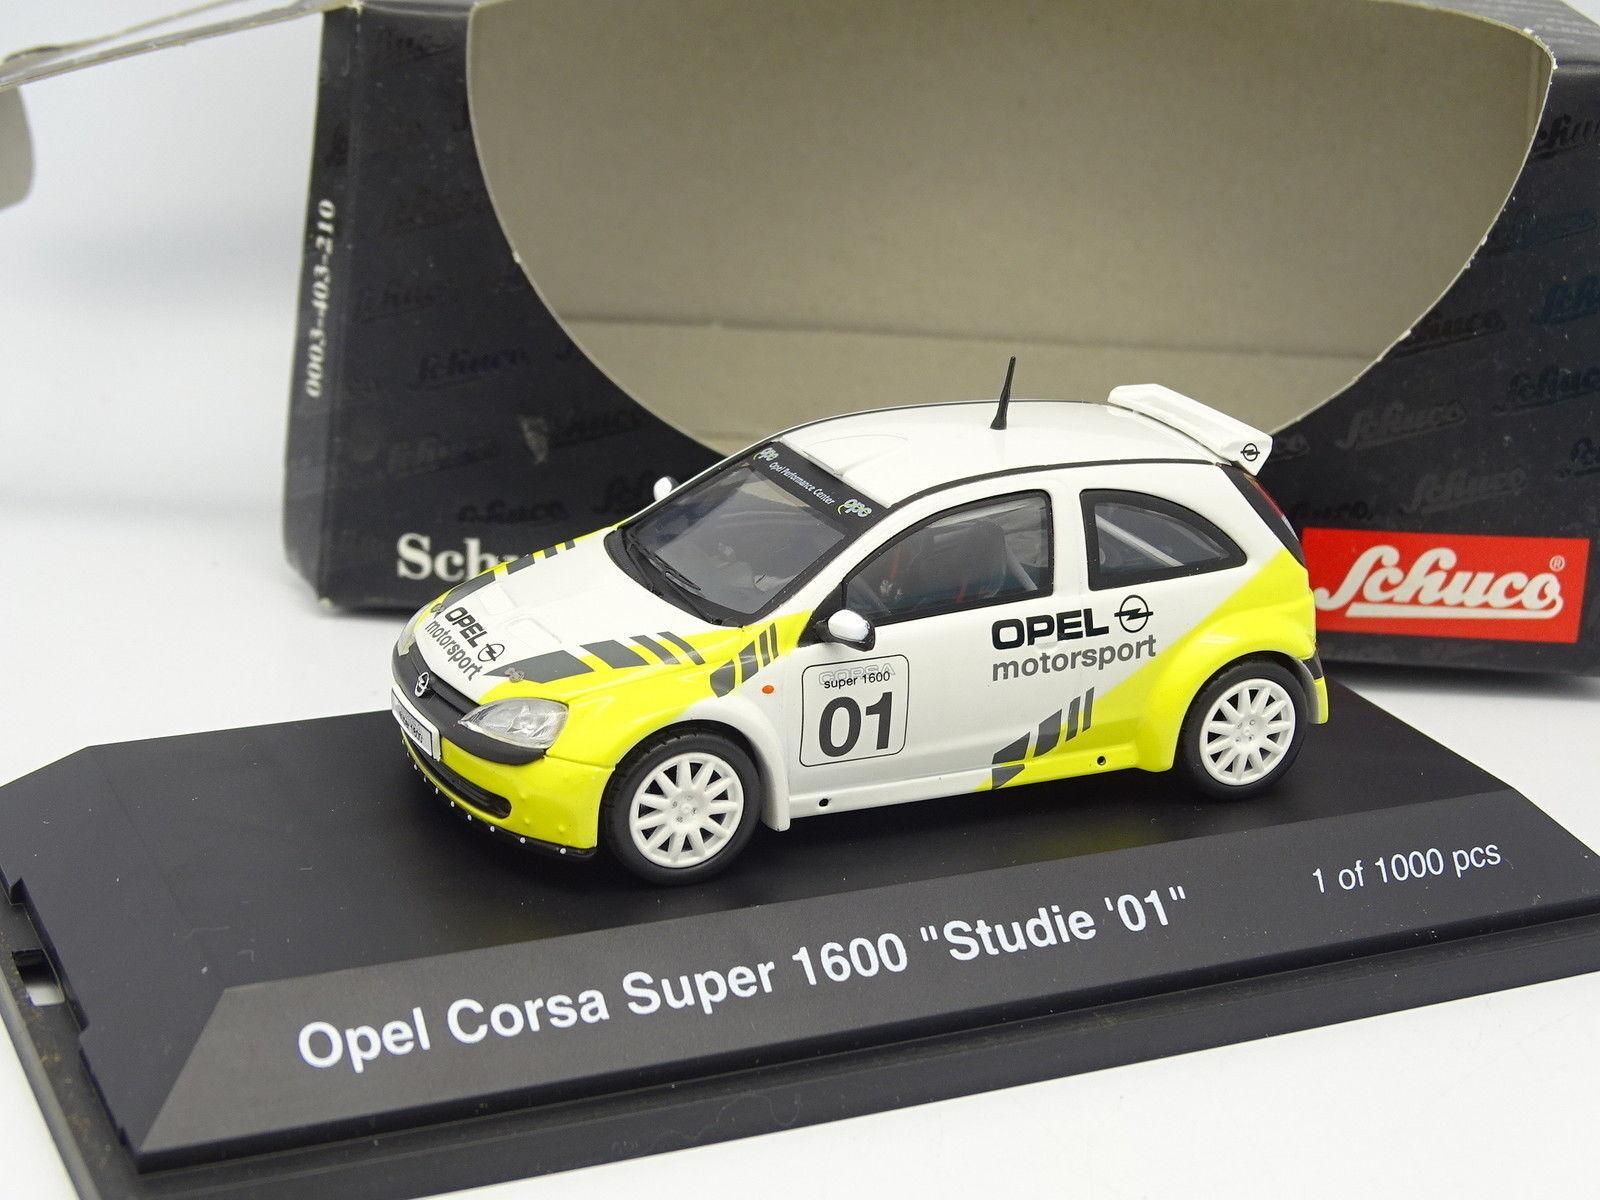 Schuco 1 43 - Opel Corsa Super 1600 Studie 01